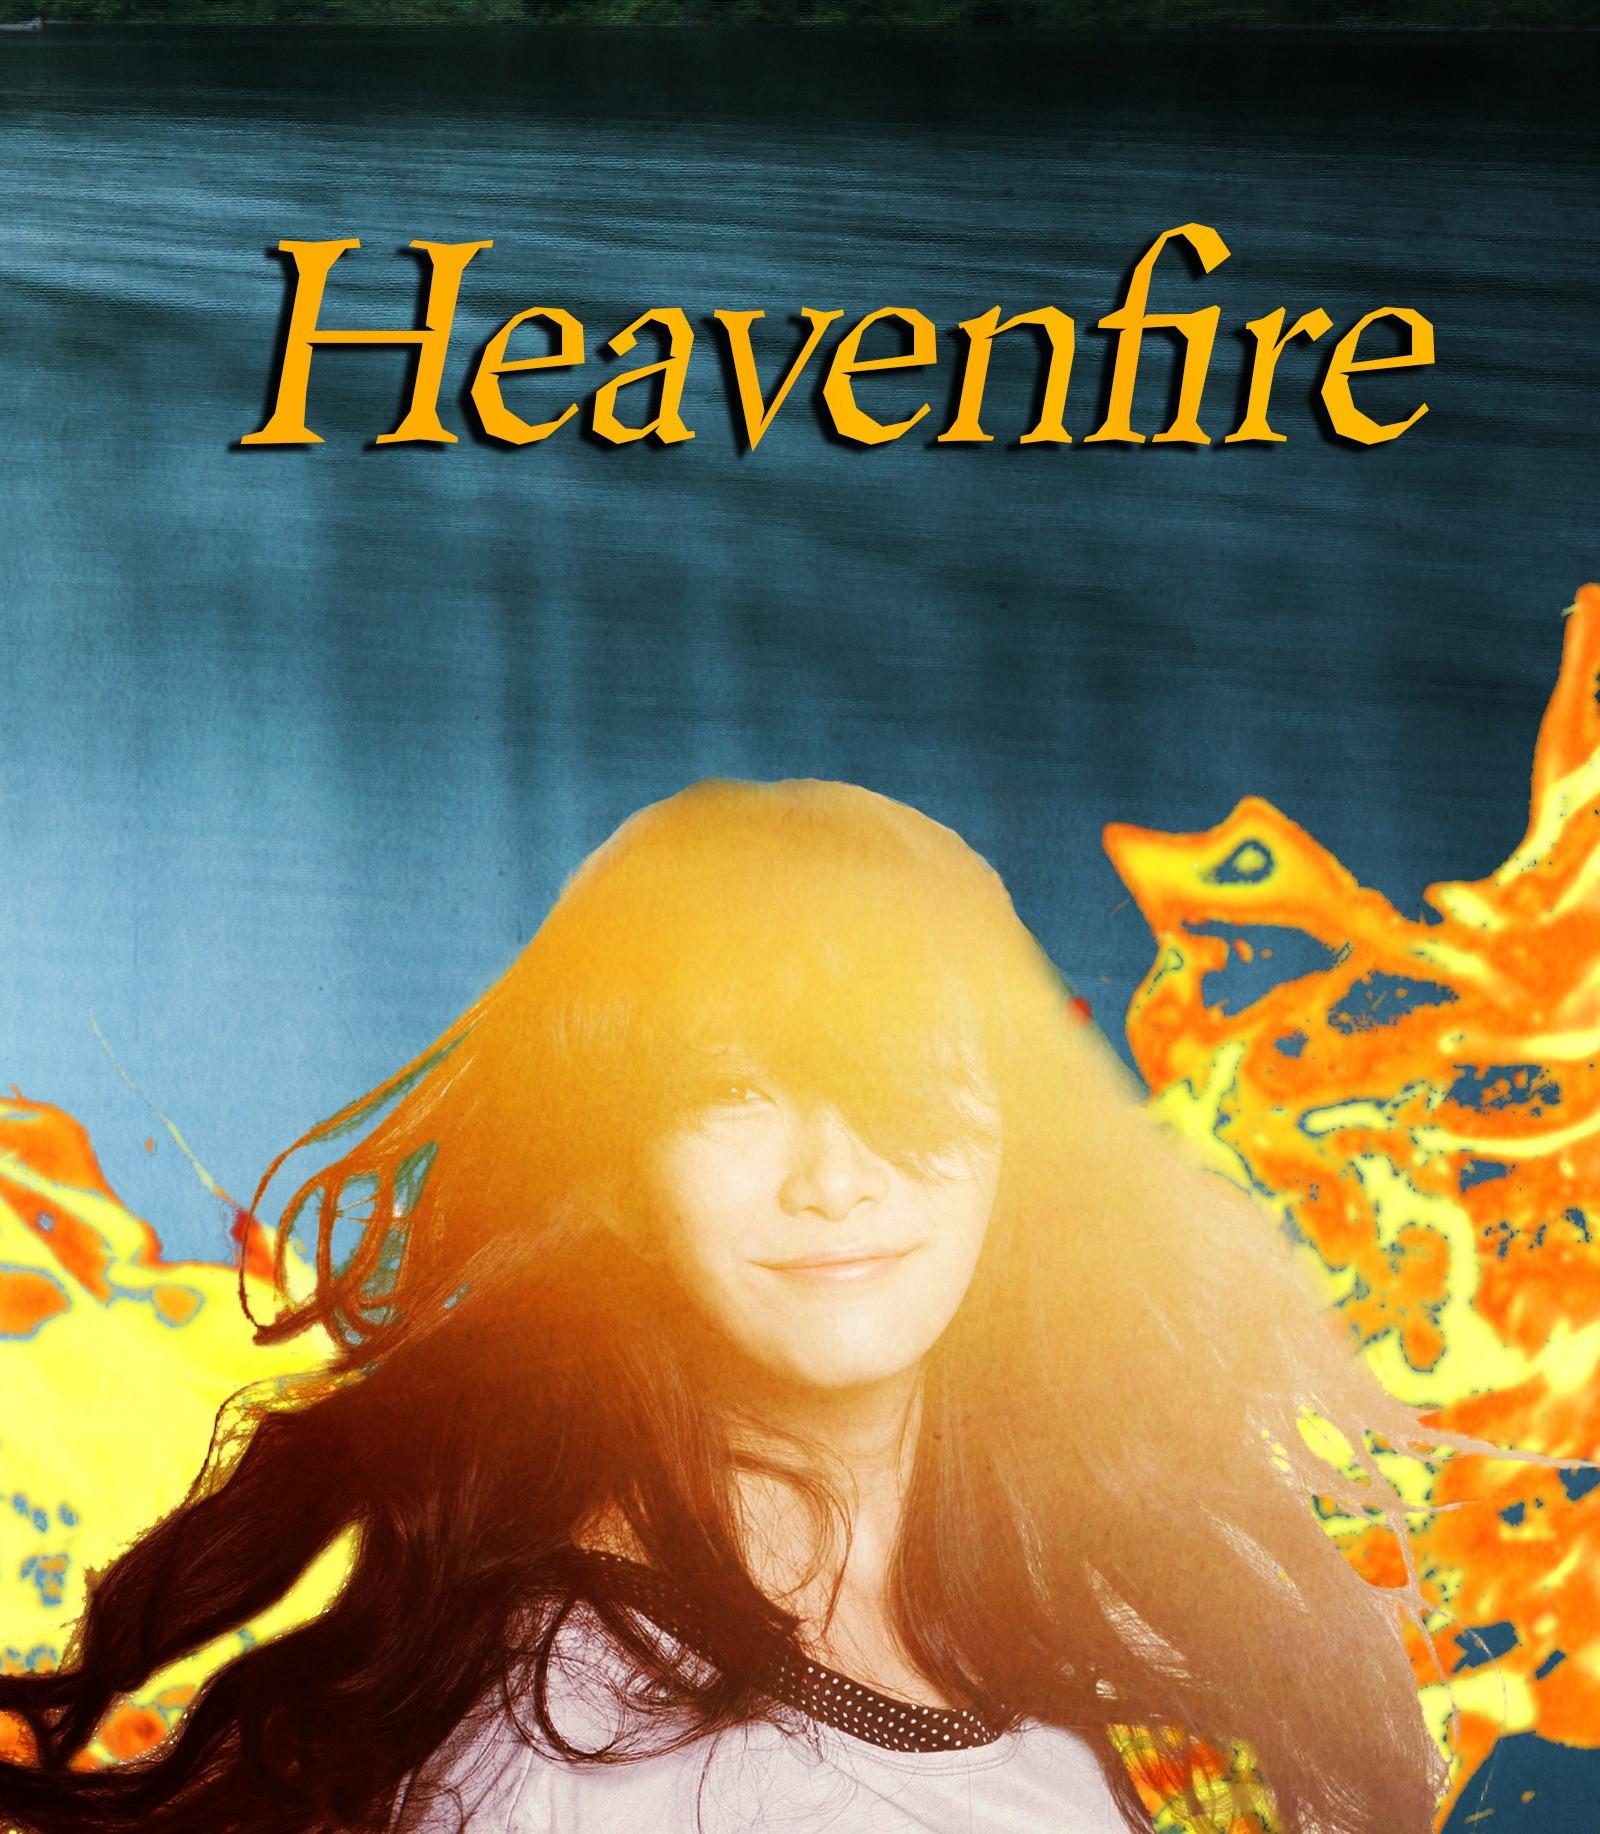 Heavenfire book signed